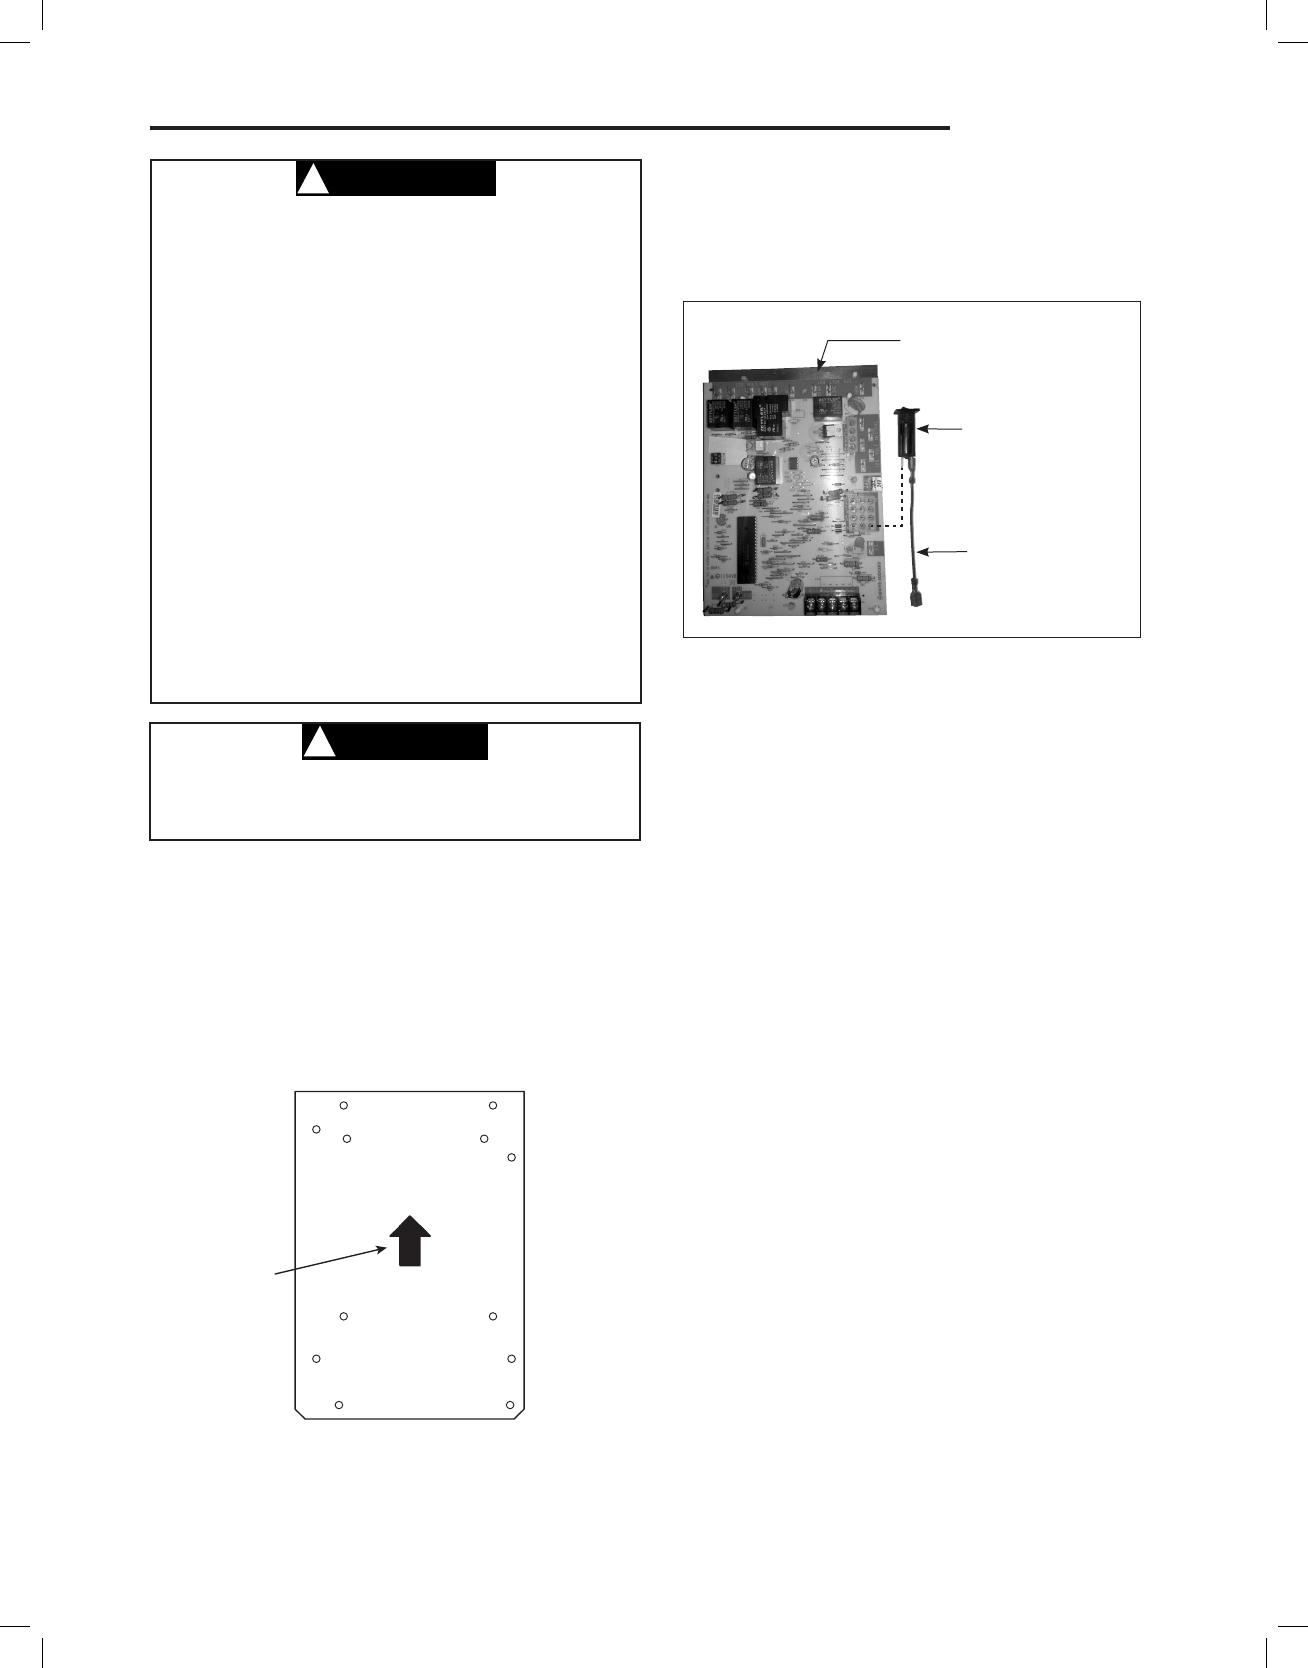 White Rodgers 21D83M-843 INSTALLATION, CAUTION !, PROCEDURE 1